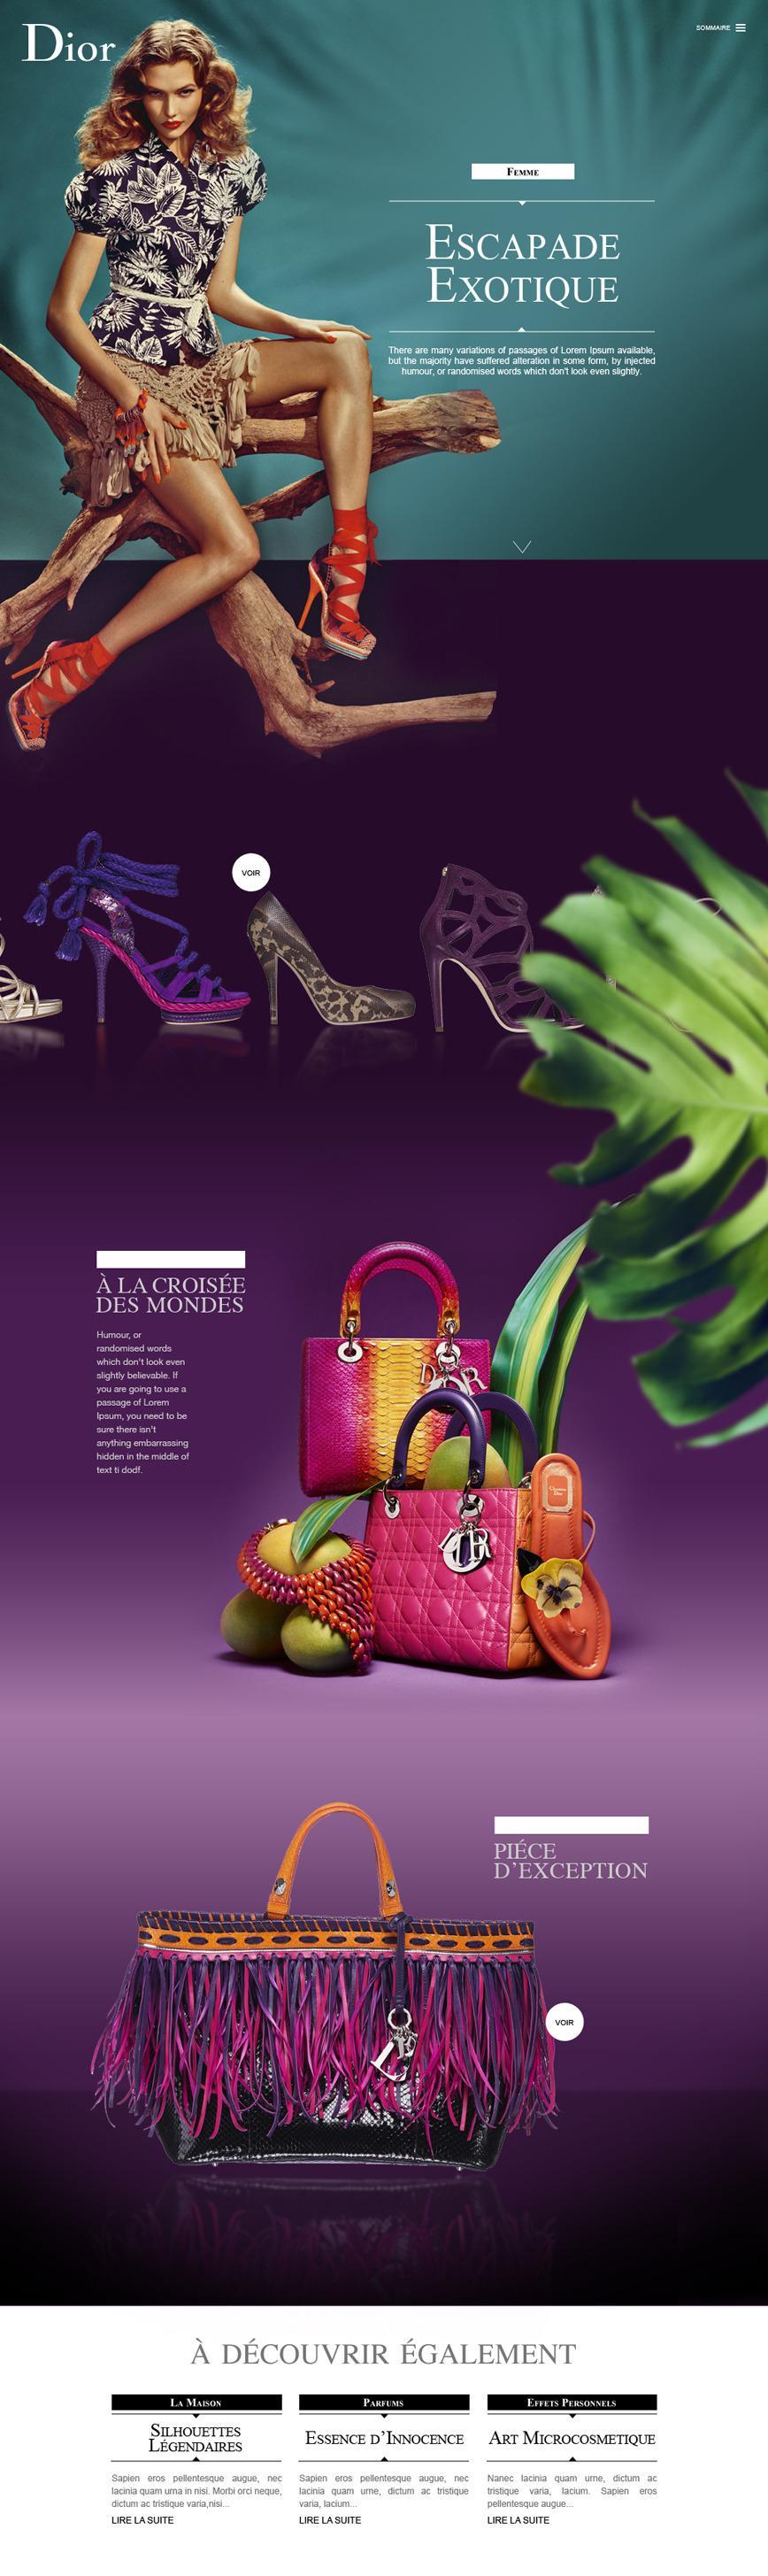 Direction Artistique Web pour Dior via Mazarine Digitale en Freelance > Creasenso